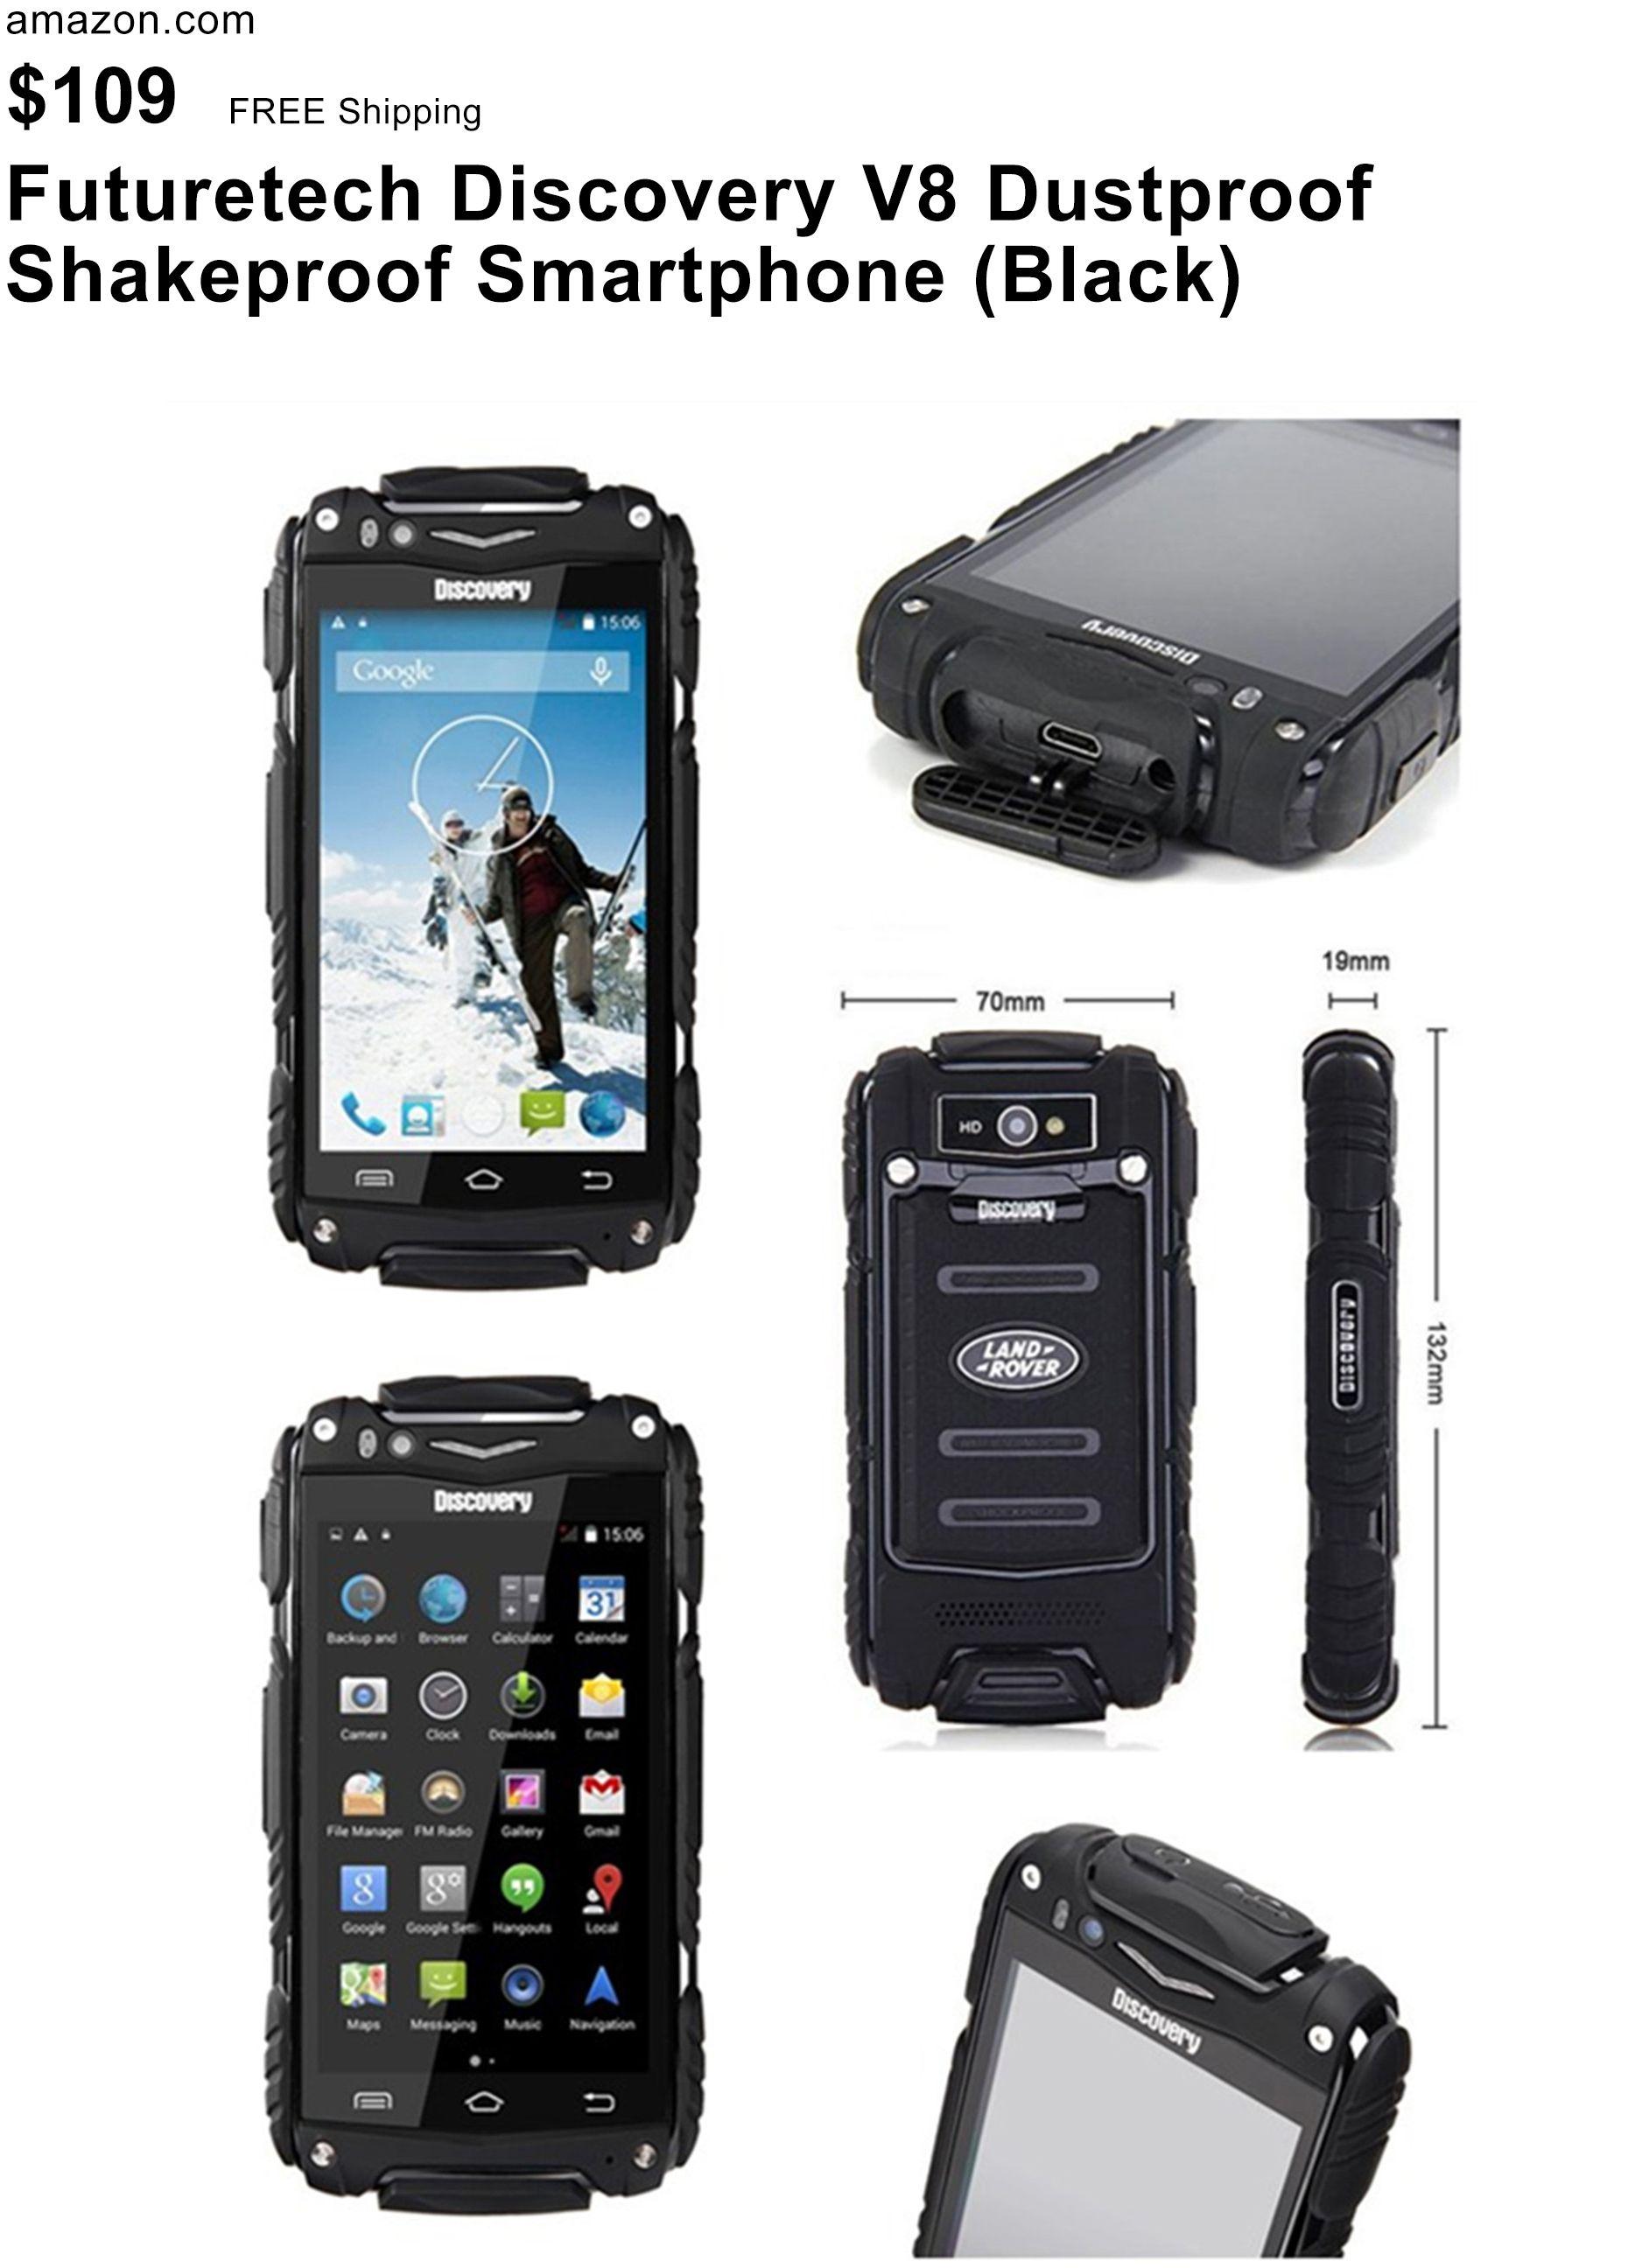 Futuretech Discovery V8 Dustproof Shakeproof Smartphone